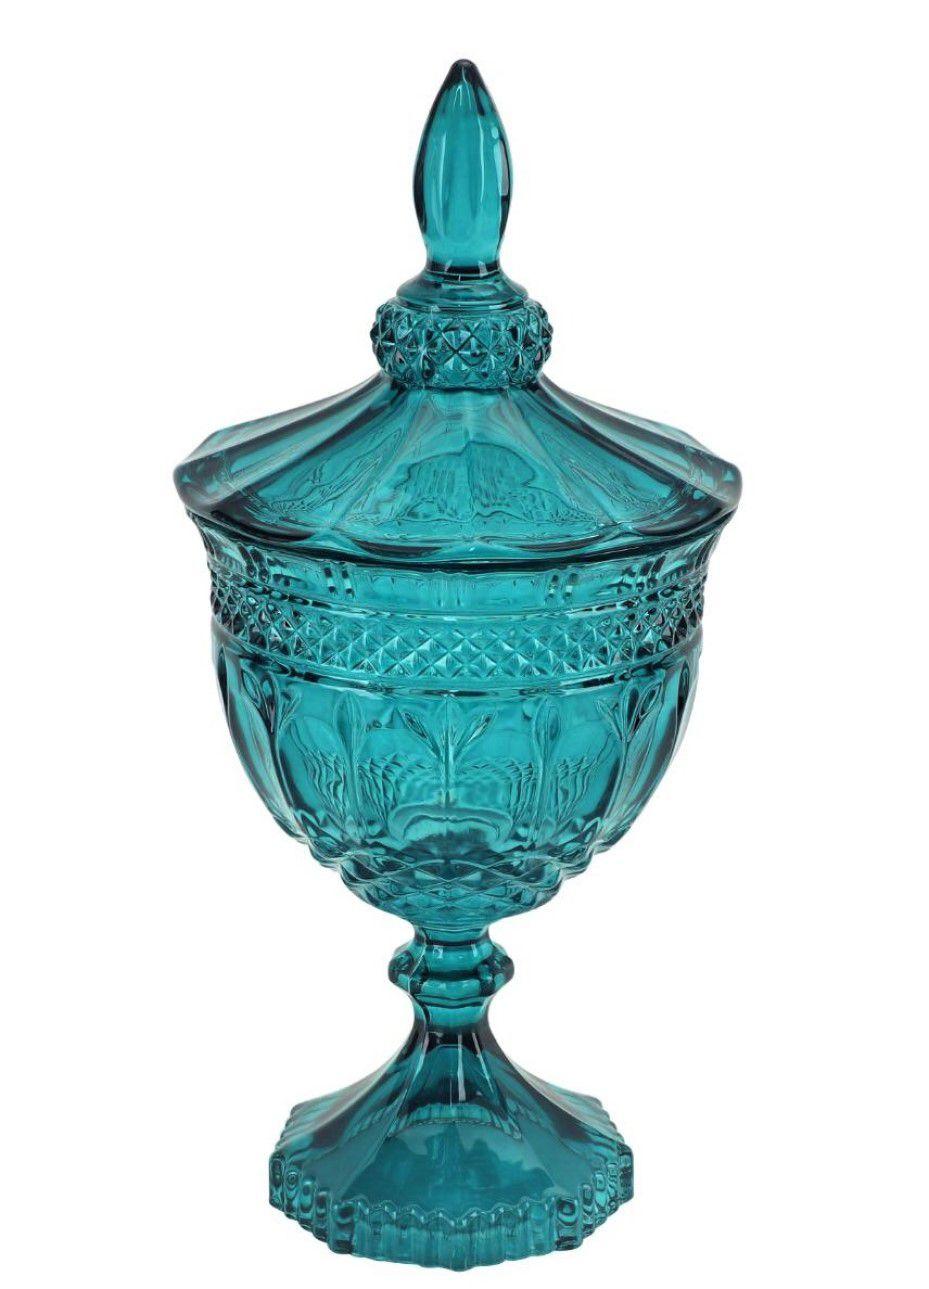 bomboniere de vidro cristal classica A25 x D12 enfeite decorativo azul Lhermitage